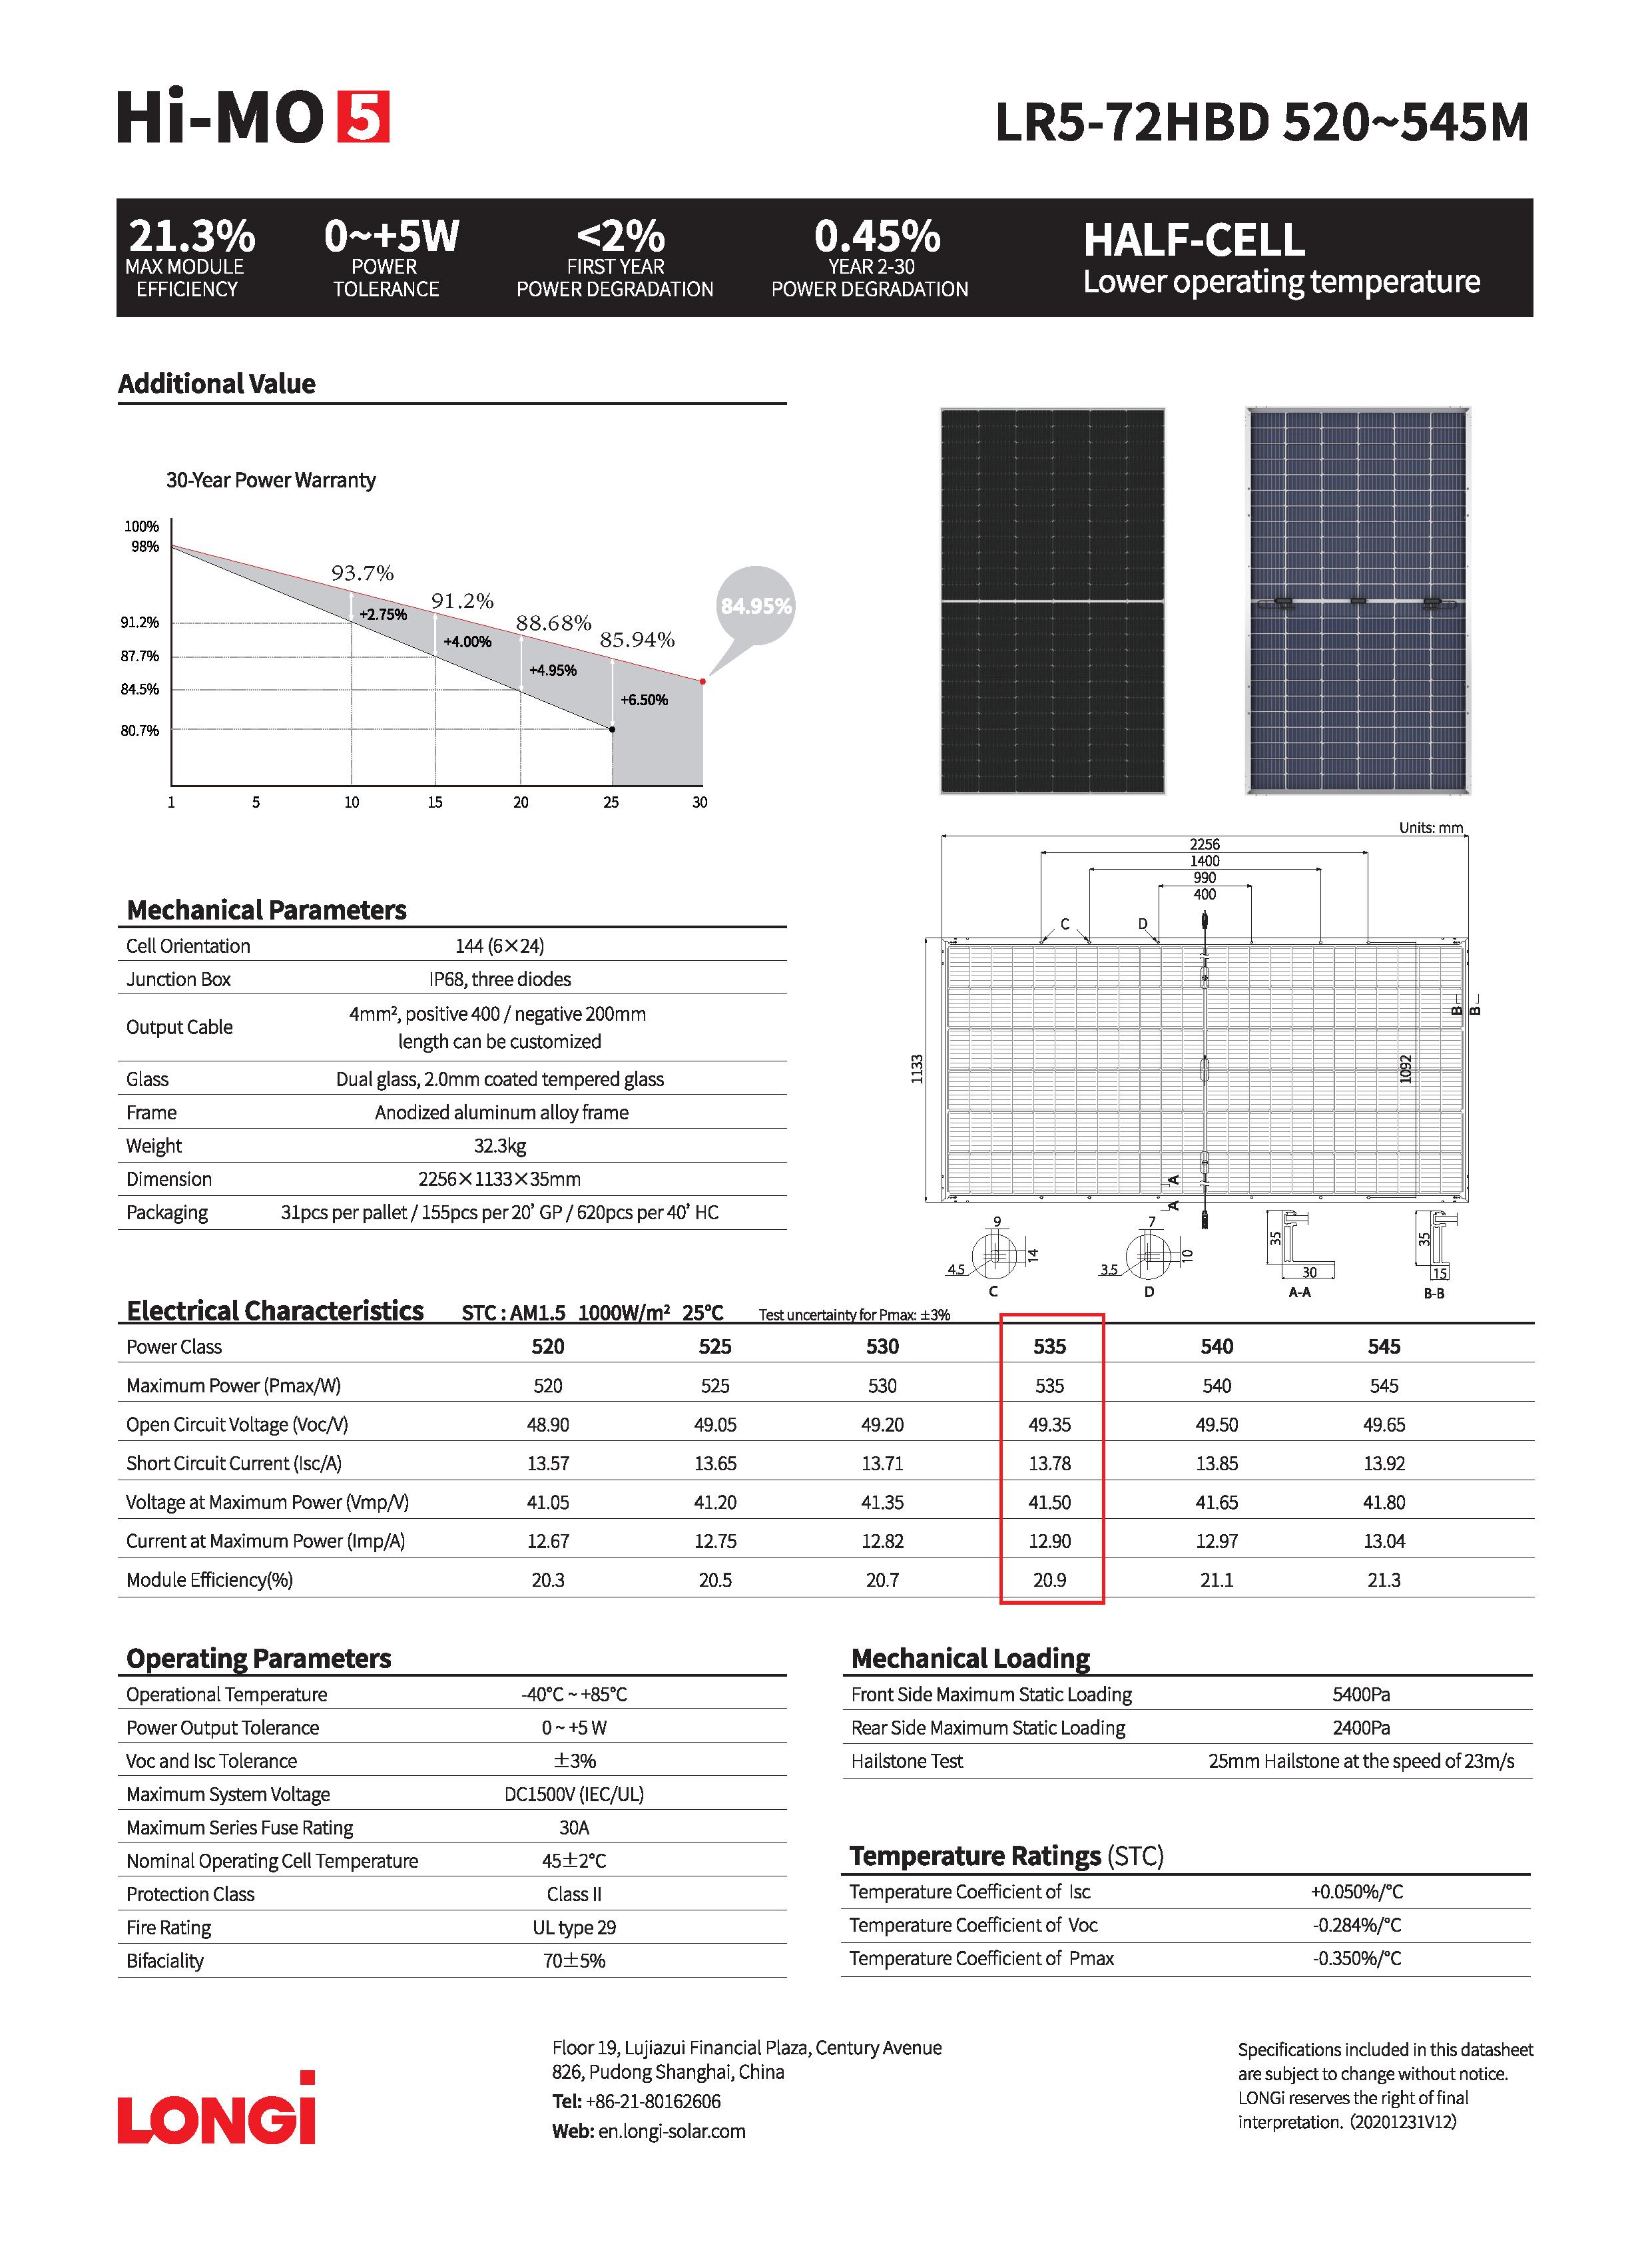 http://solarcellcenter.com/img/cms/LONGi Solar Mono PV/LR5-72HBD 520-545M Data Sheet_Page_2.png